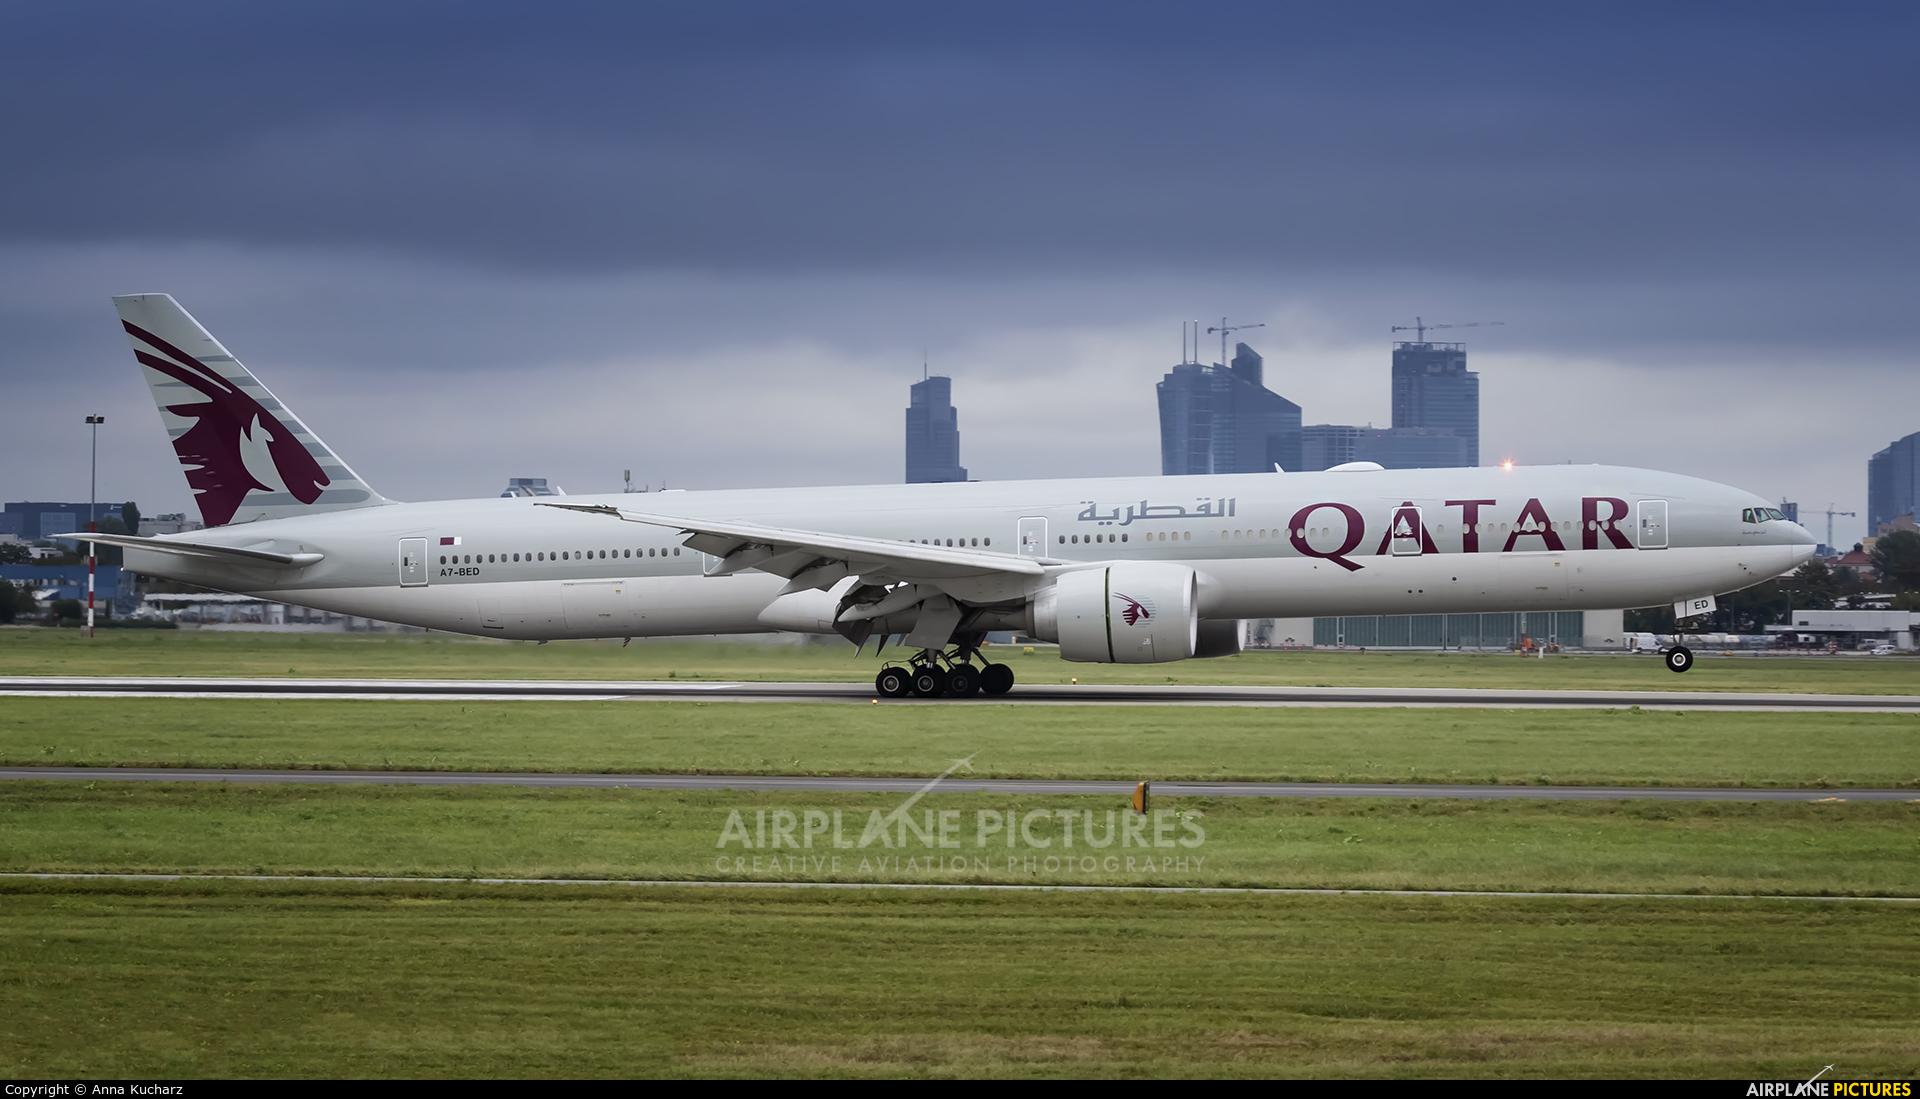 Qatar Airways A7-BED aircraft at Warsaw - Frederic Chopin